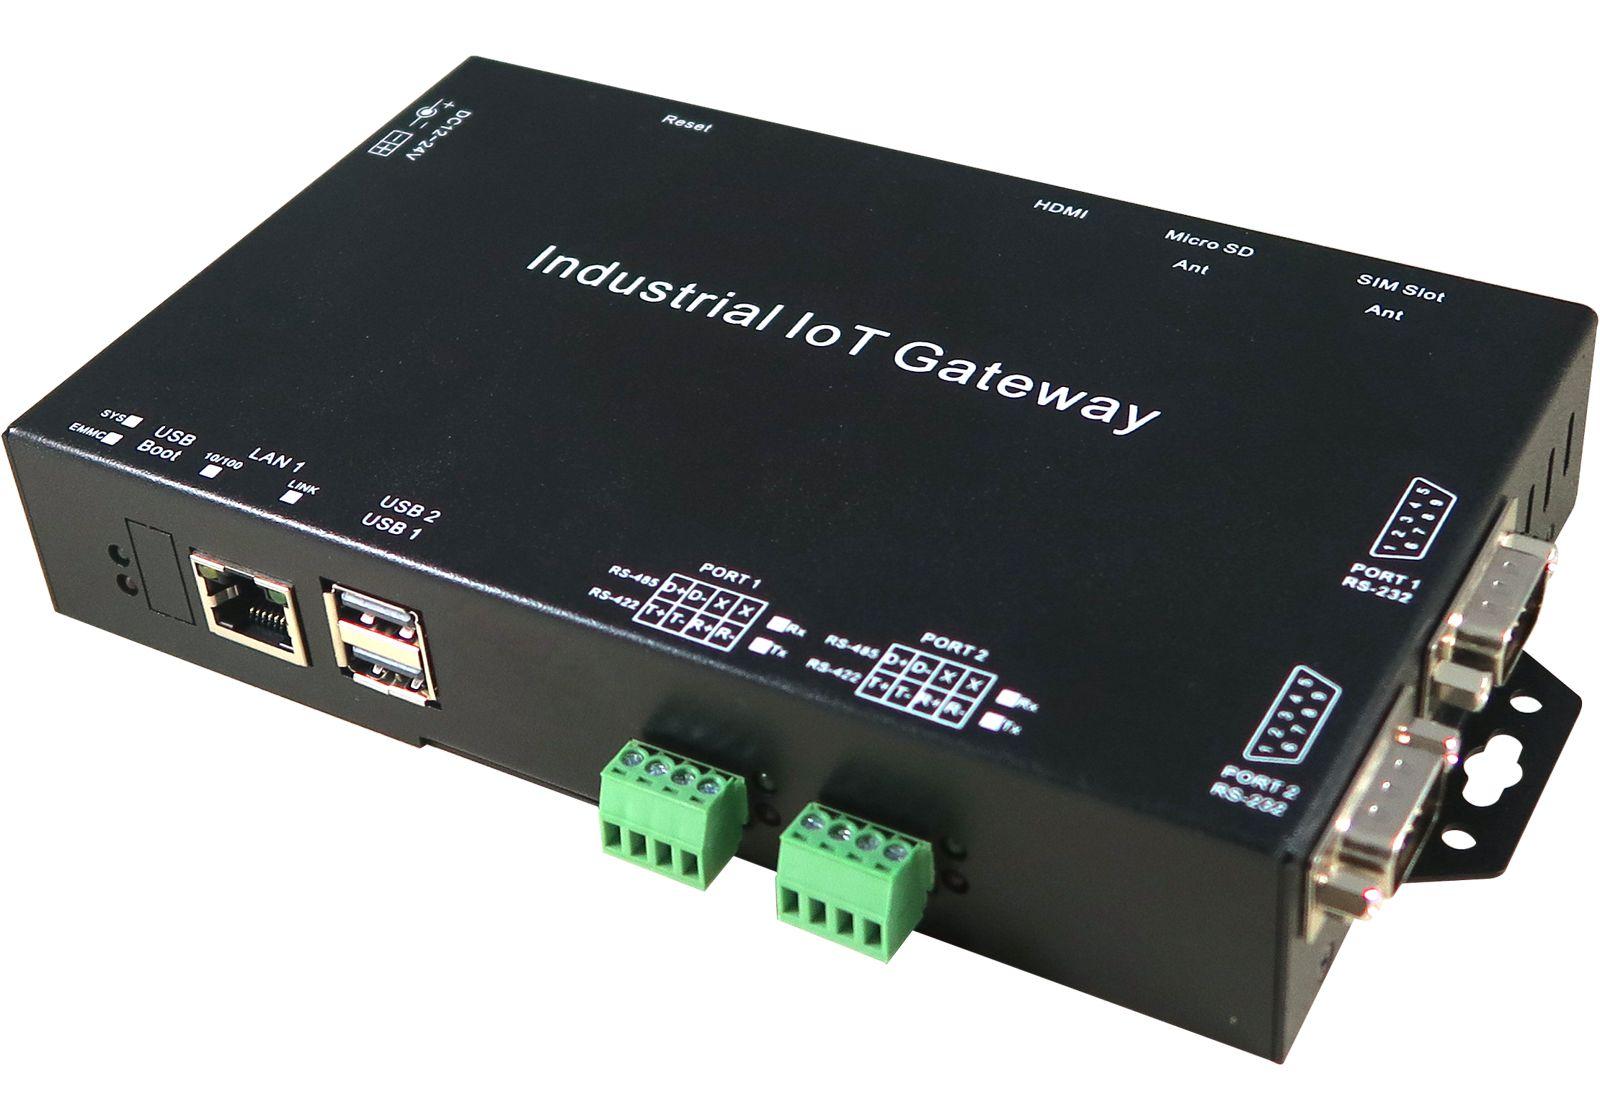 PC630CM3 – Raspberry Pi CM3 Linux OS Programmable Controller